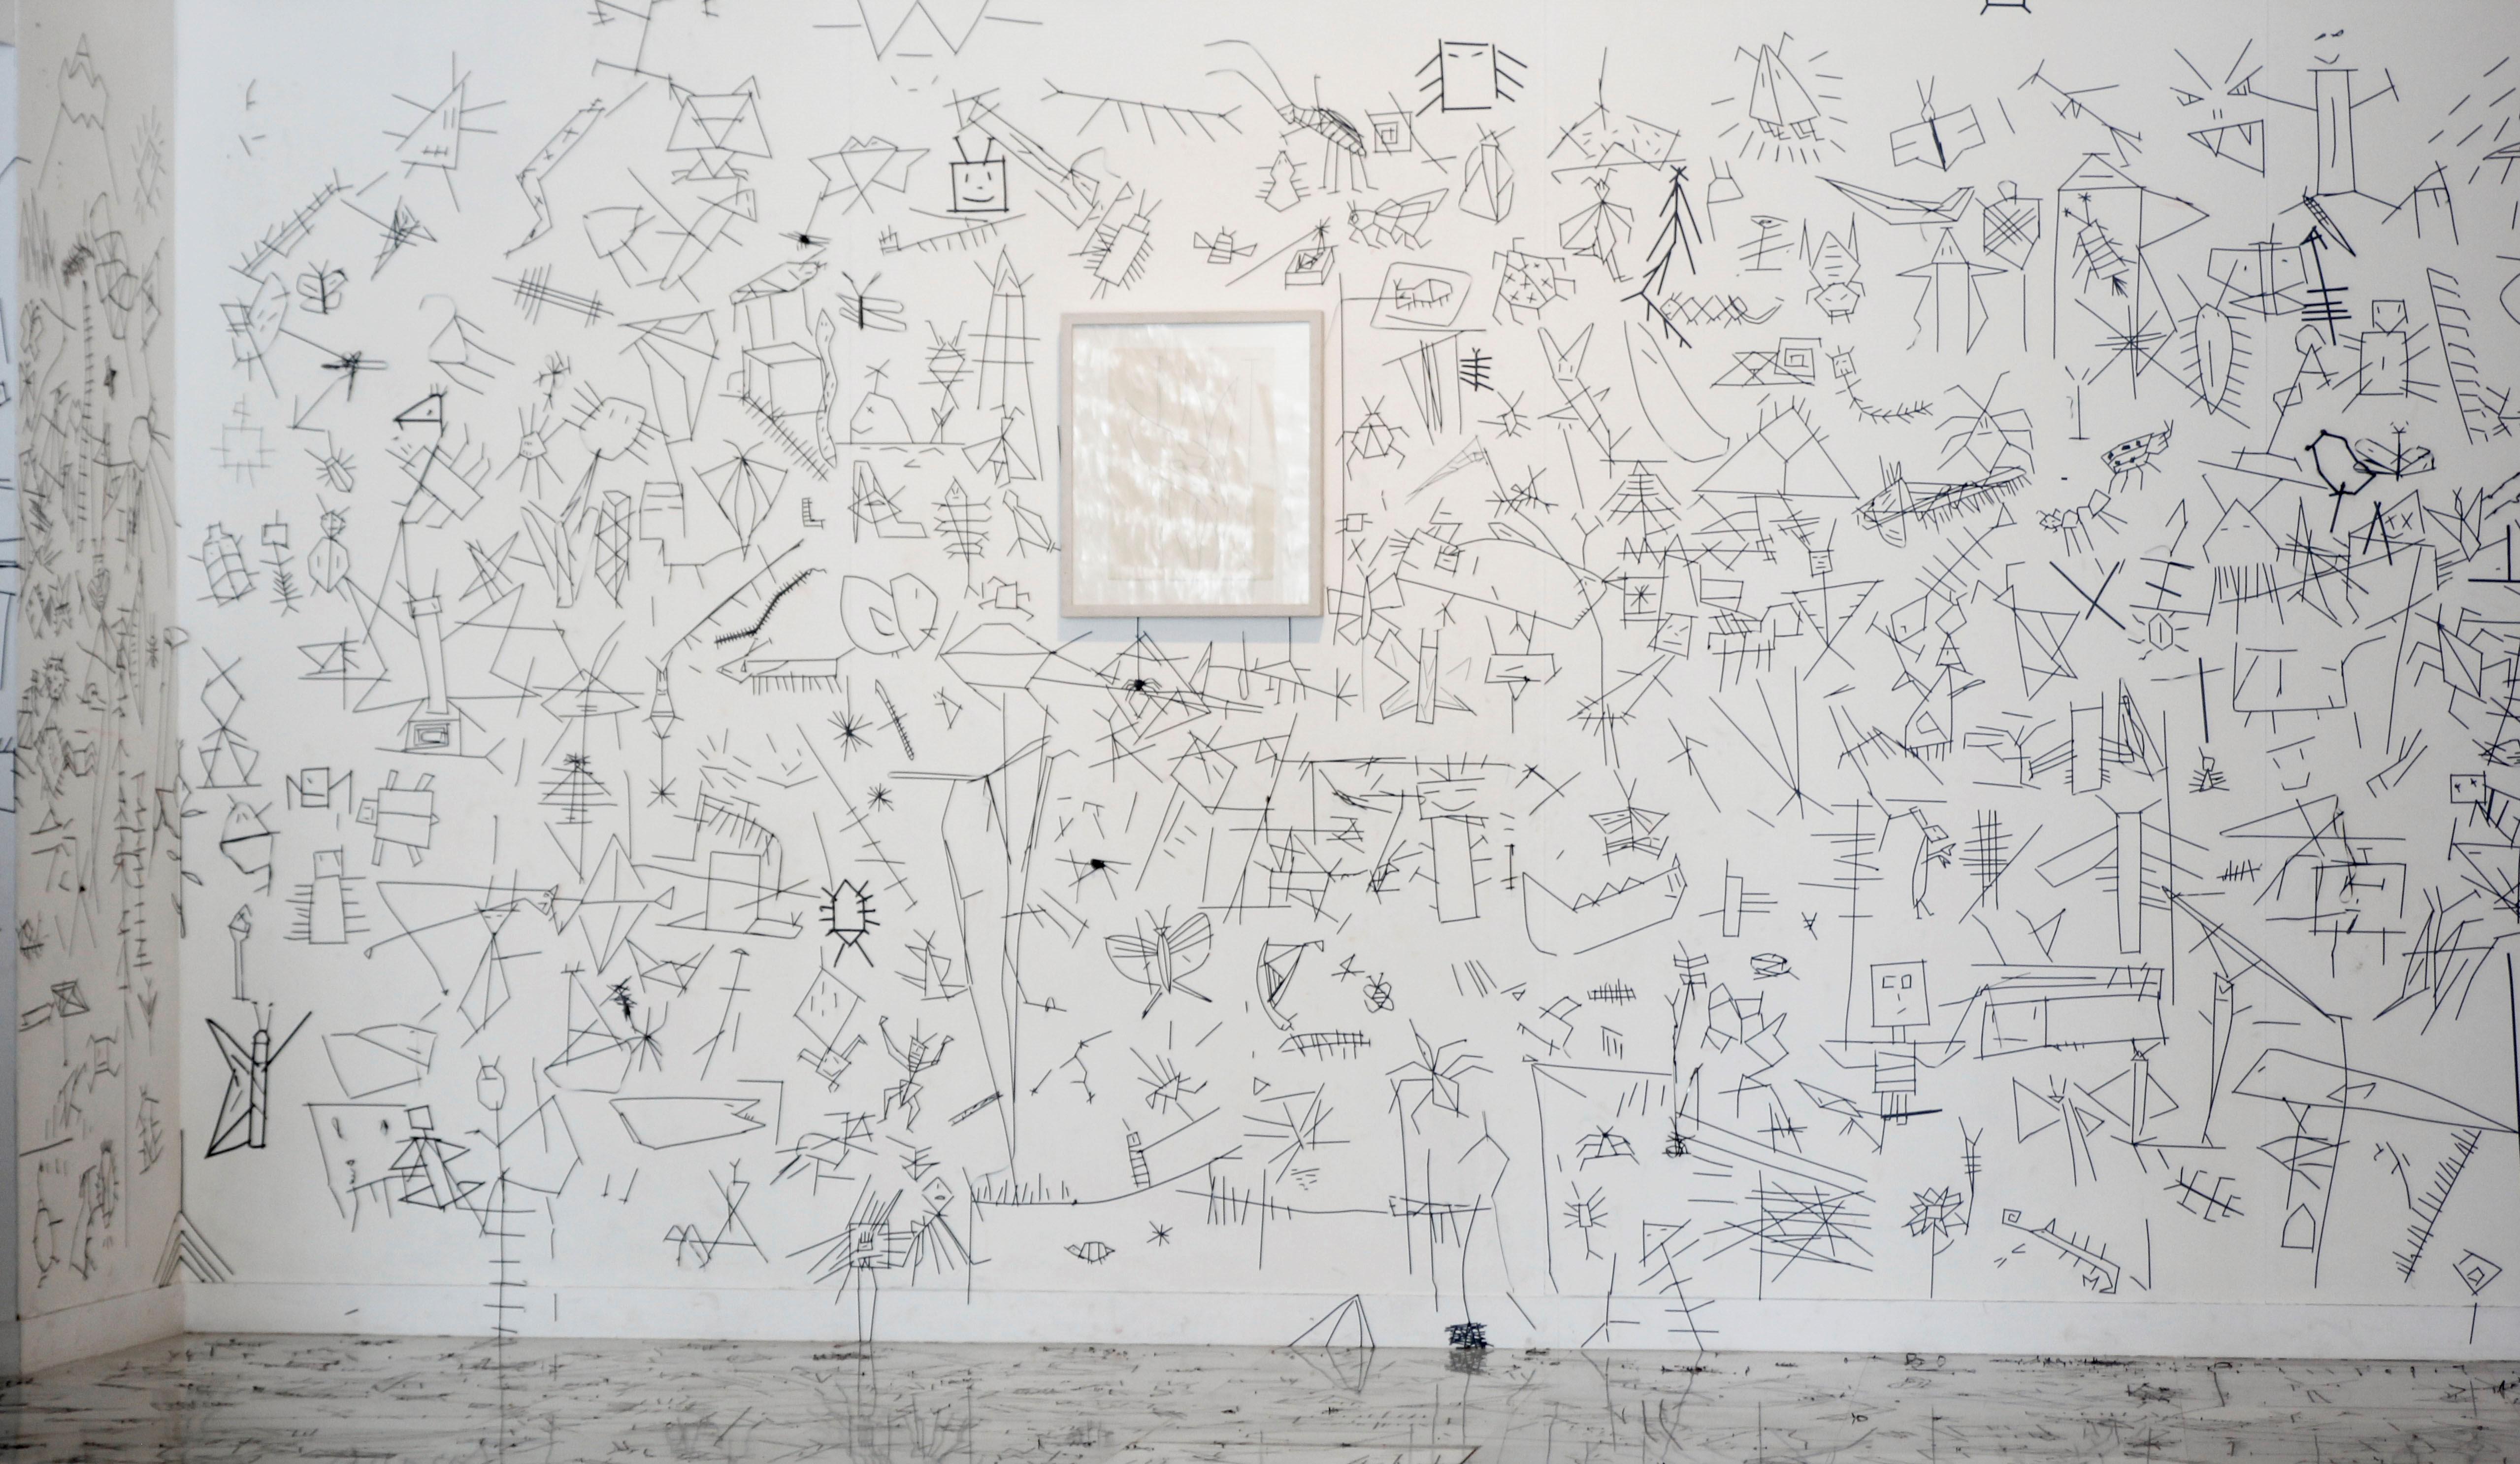 Cepeda,MiguelÁngel. 2016. Picasso 5.